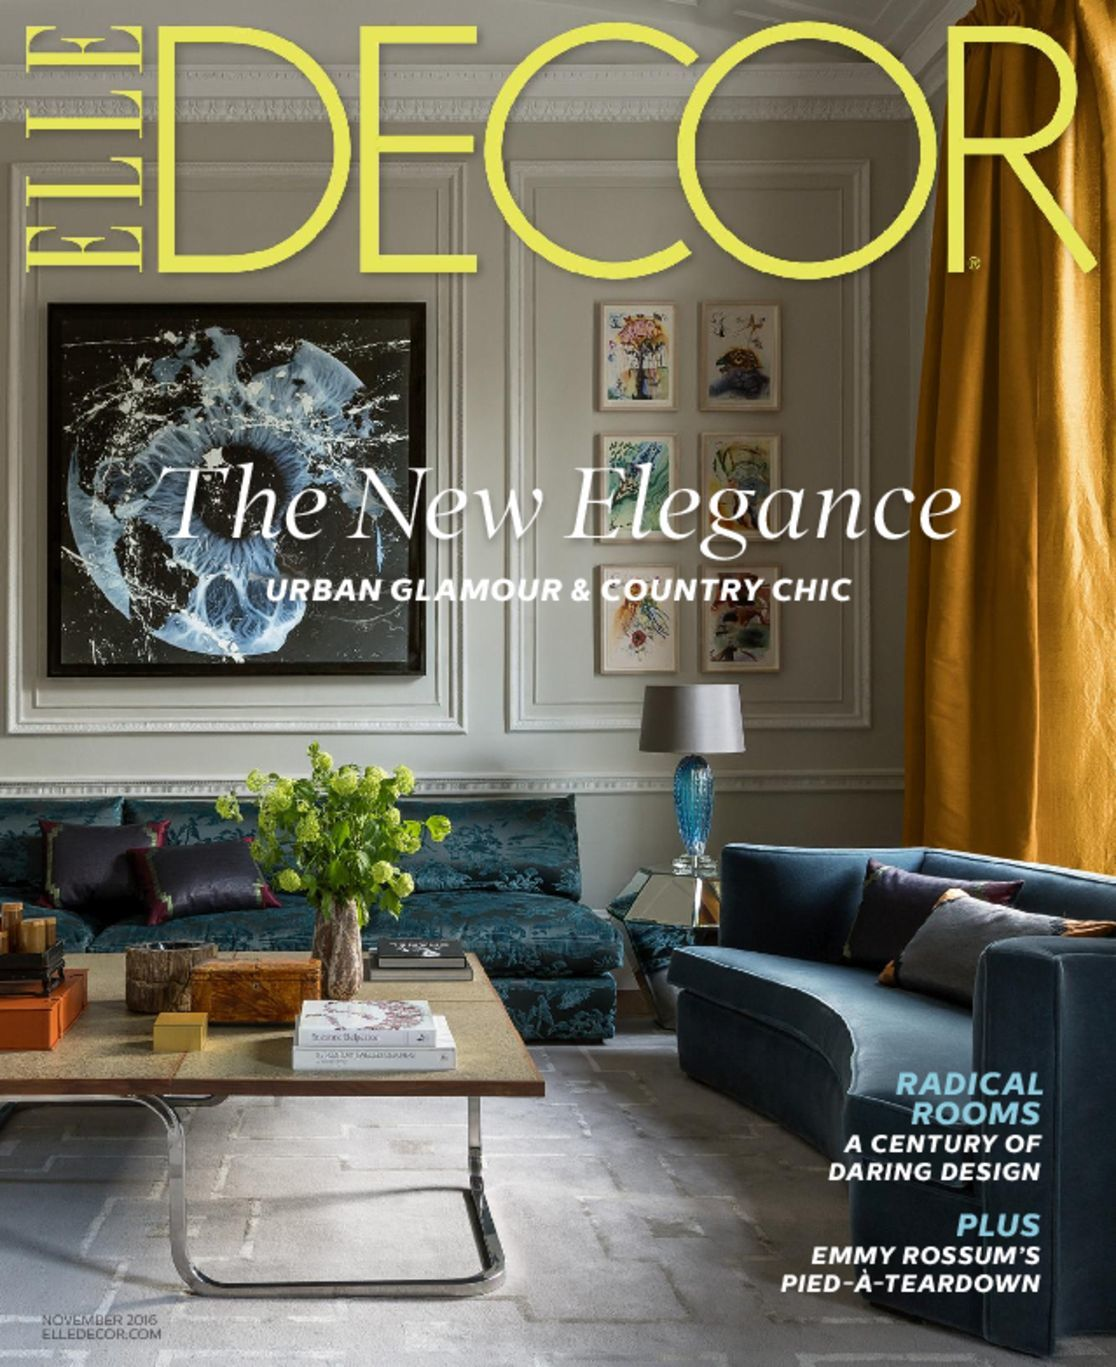 At Home Design: Grant K. Gibson 20 INTERIOR DESIGN TERMS